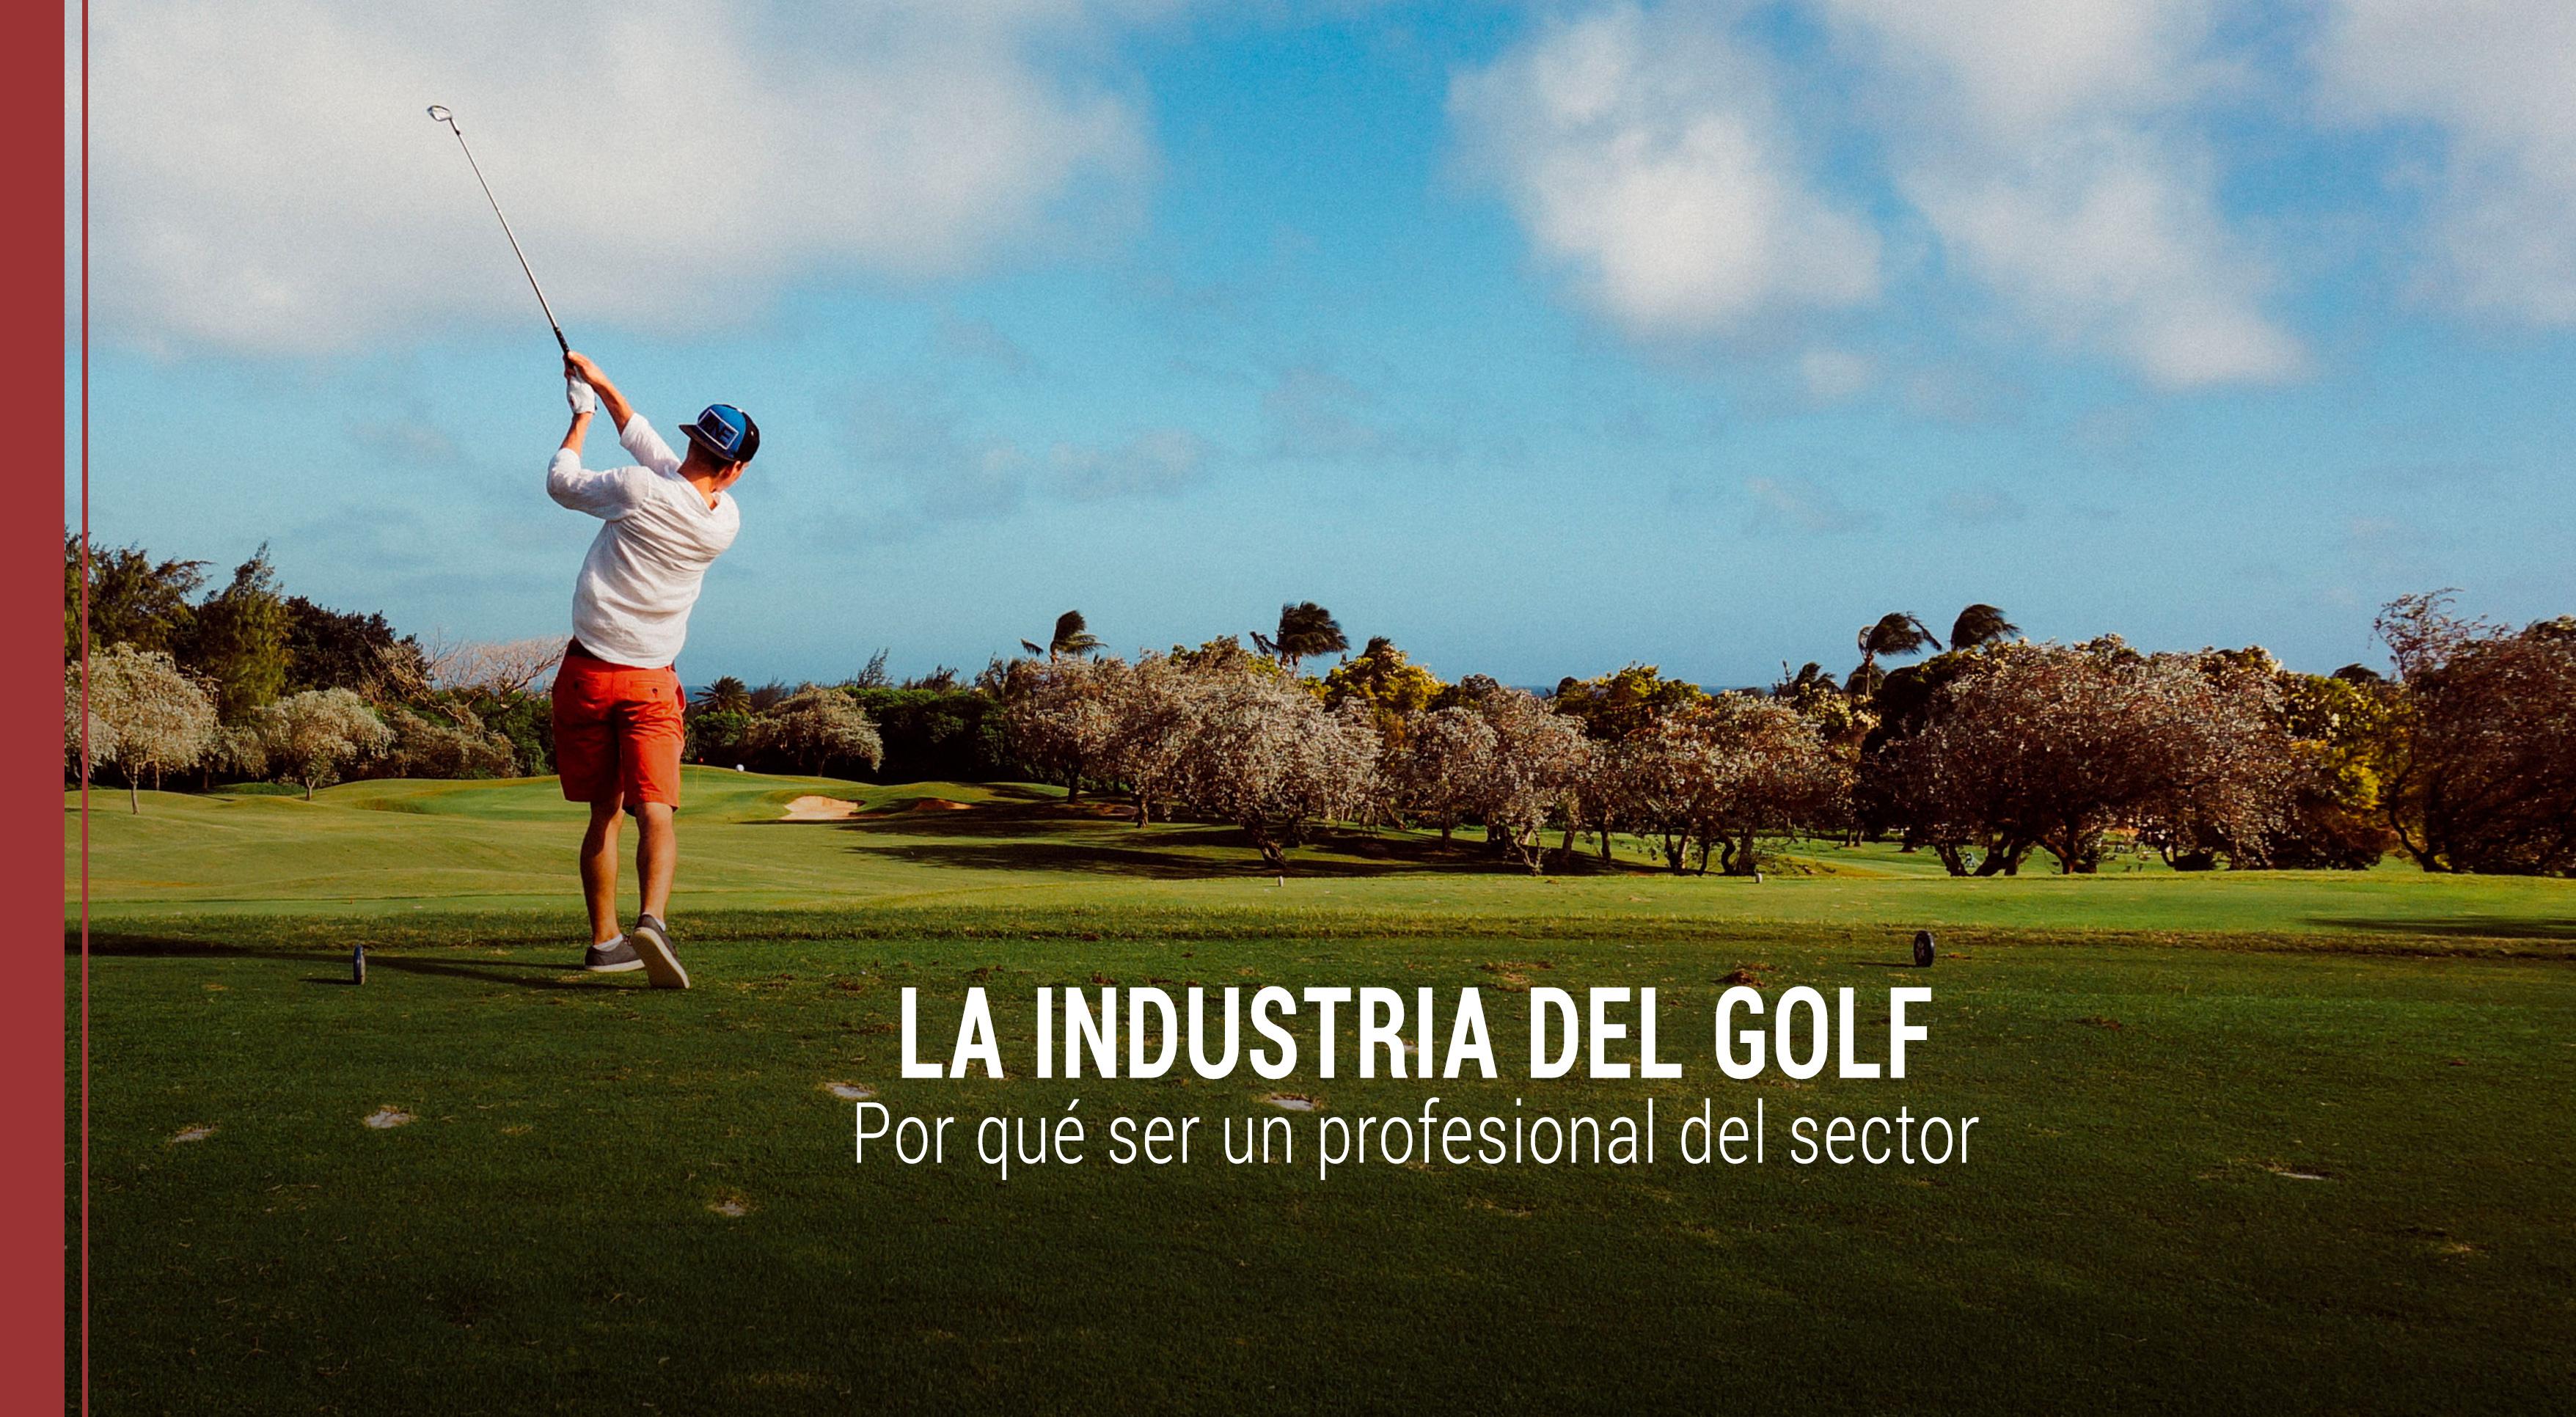 industria-golf-profesional-sector La industria del golf: por qué ser un profesional del sector